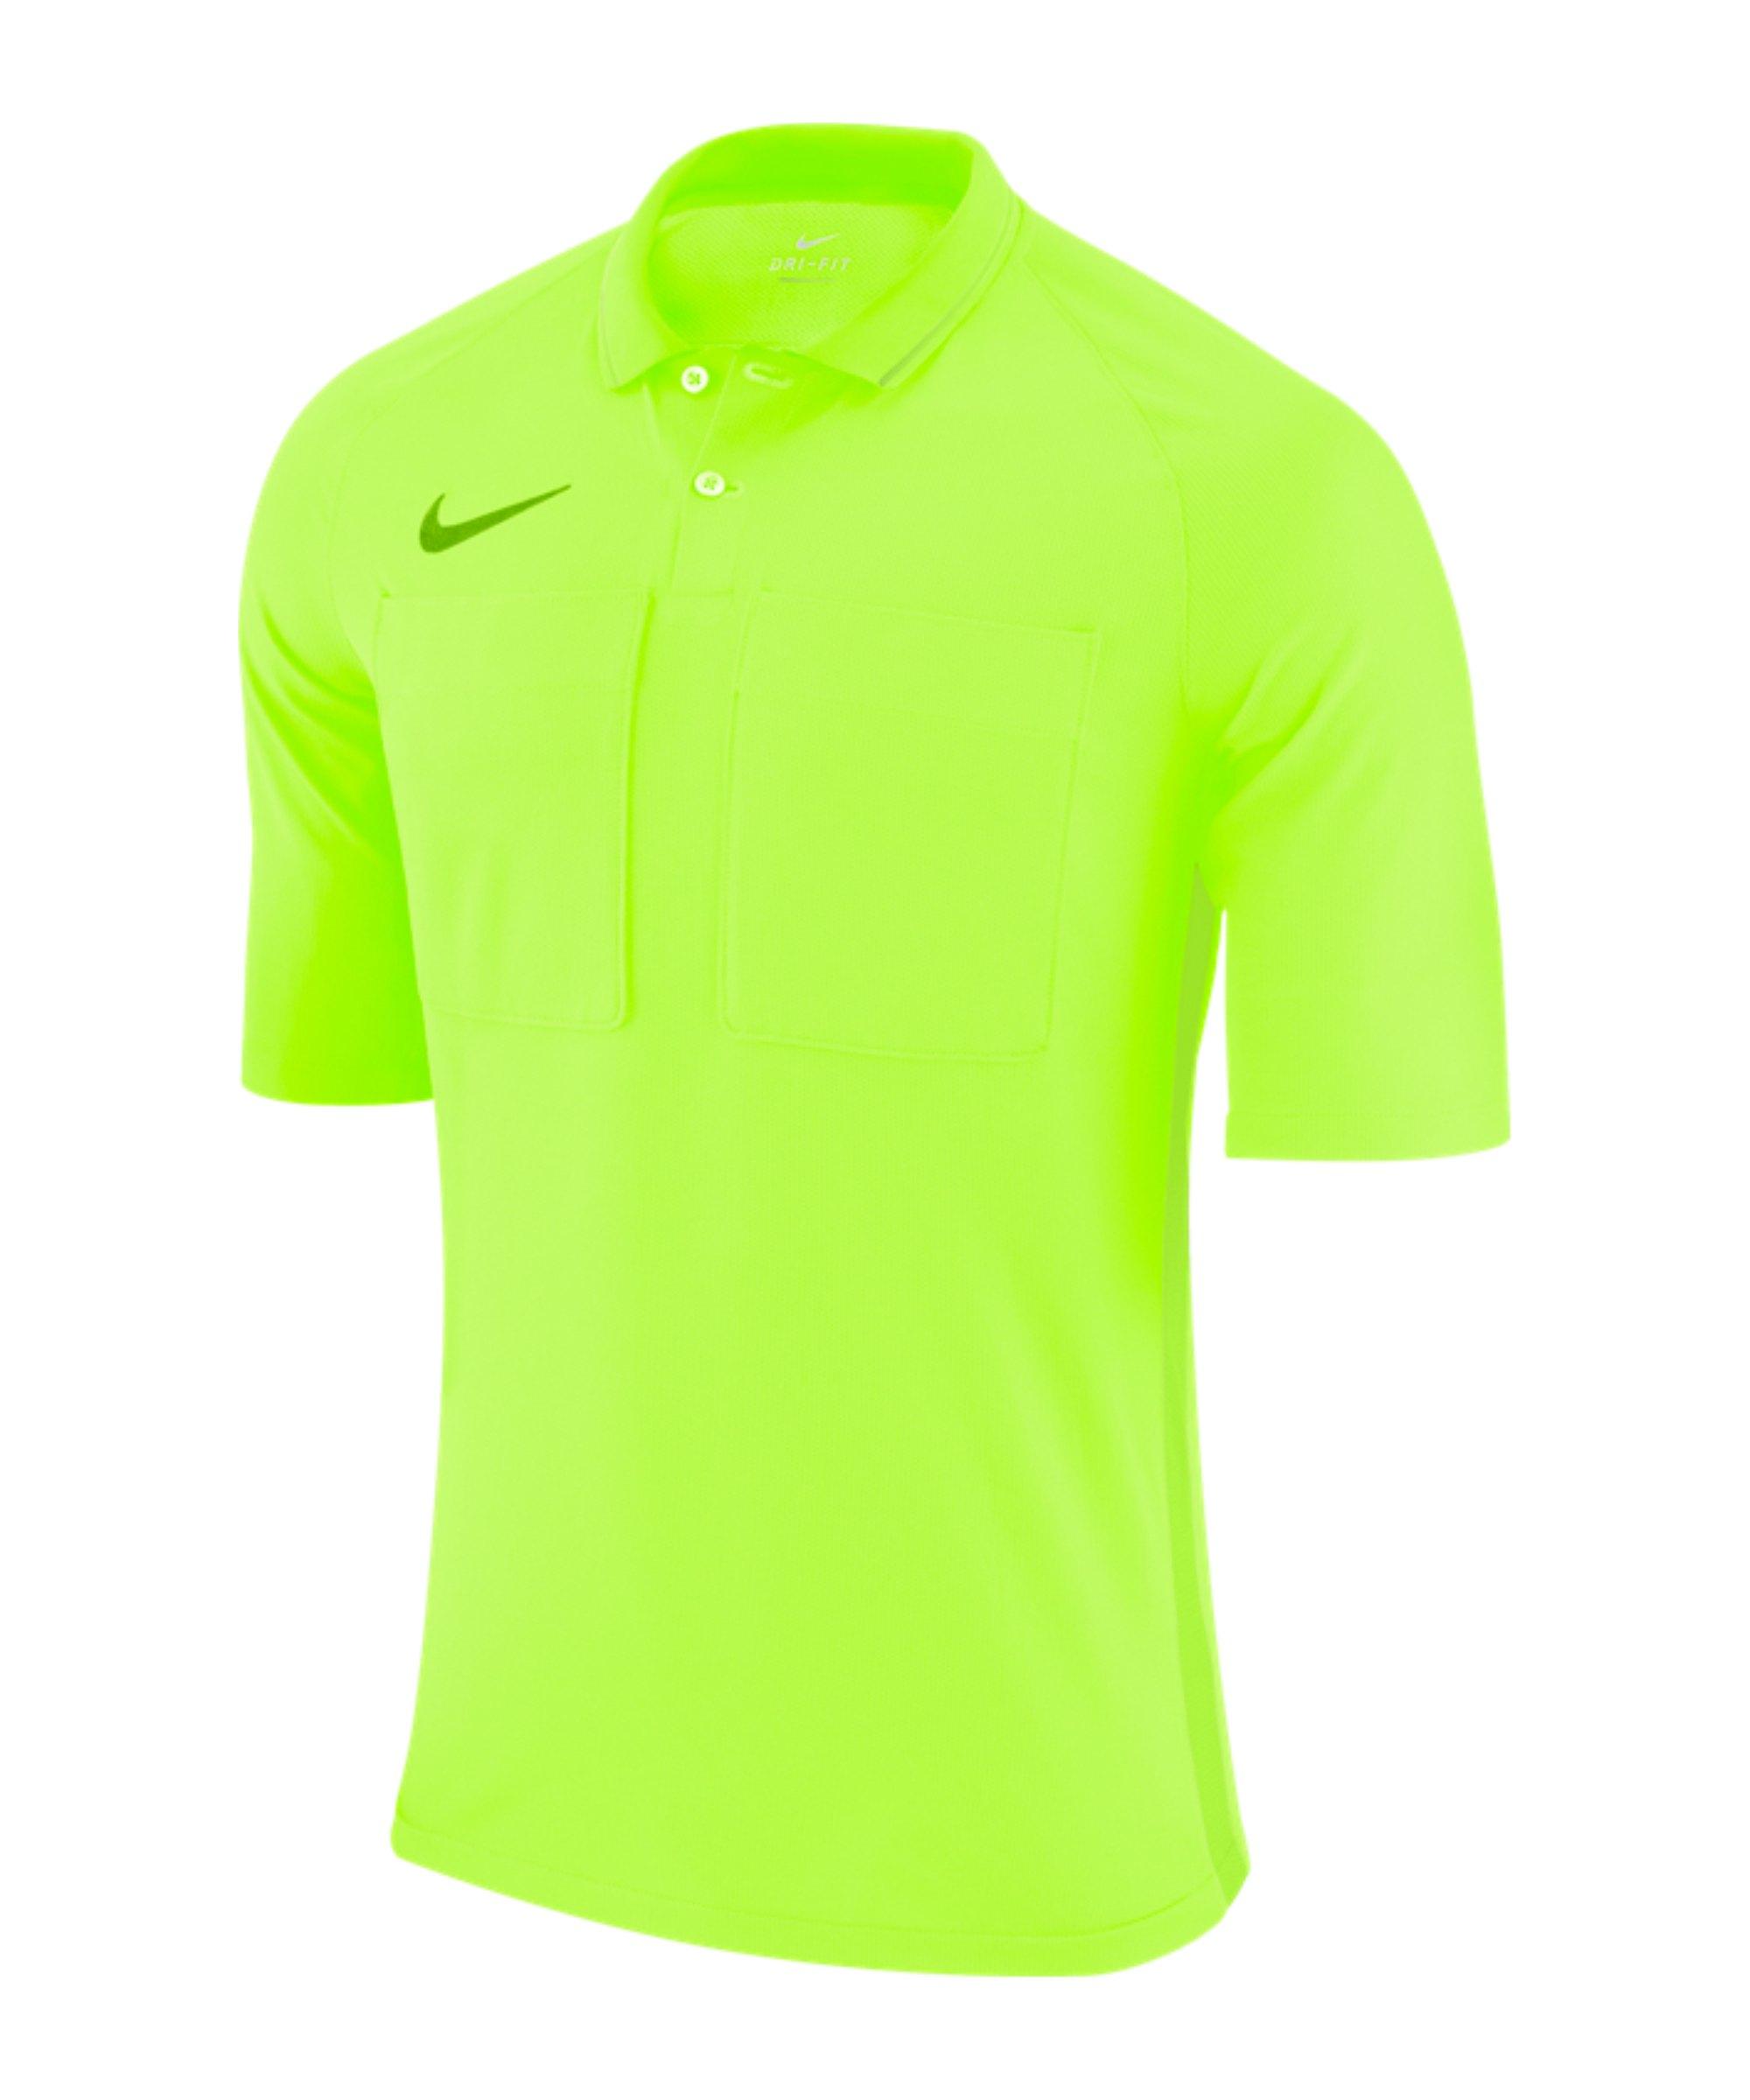 Nike Dry Referee Trikot kurzarm Gelb F703 - gelb